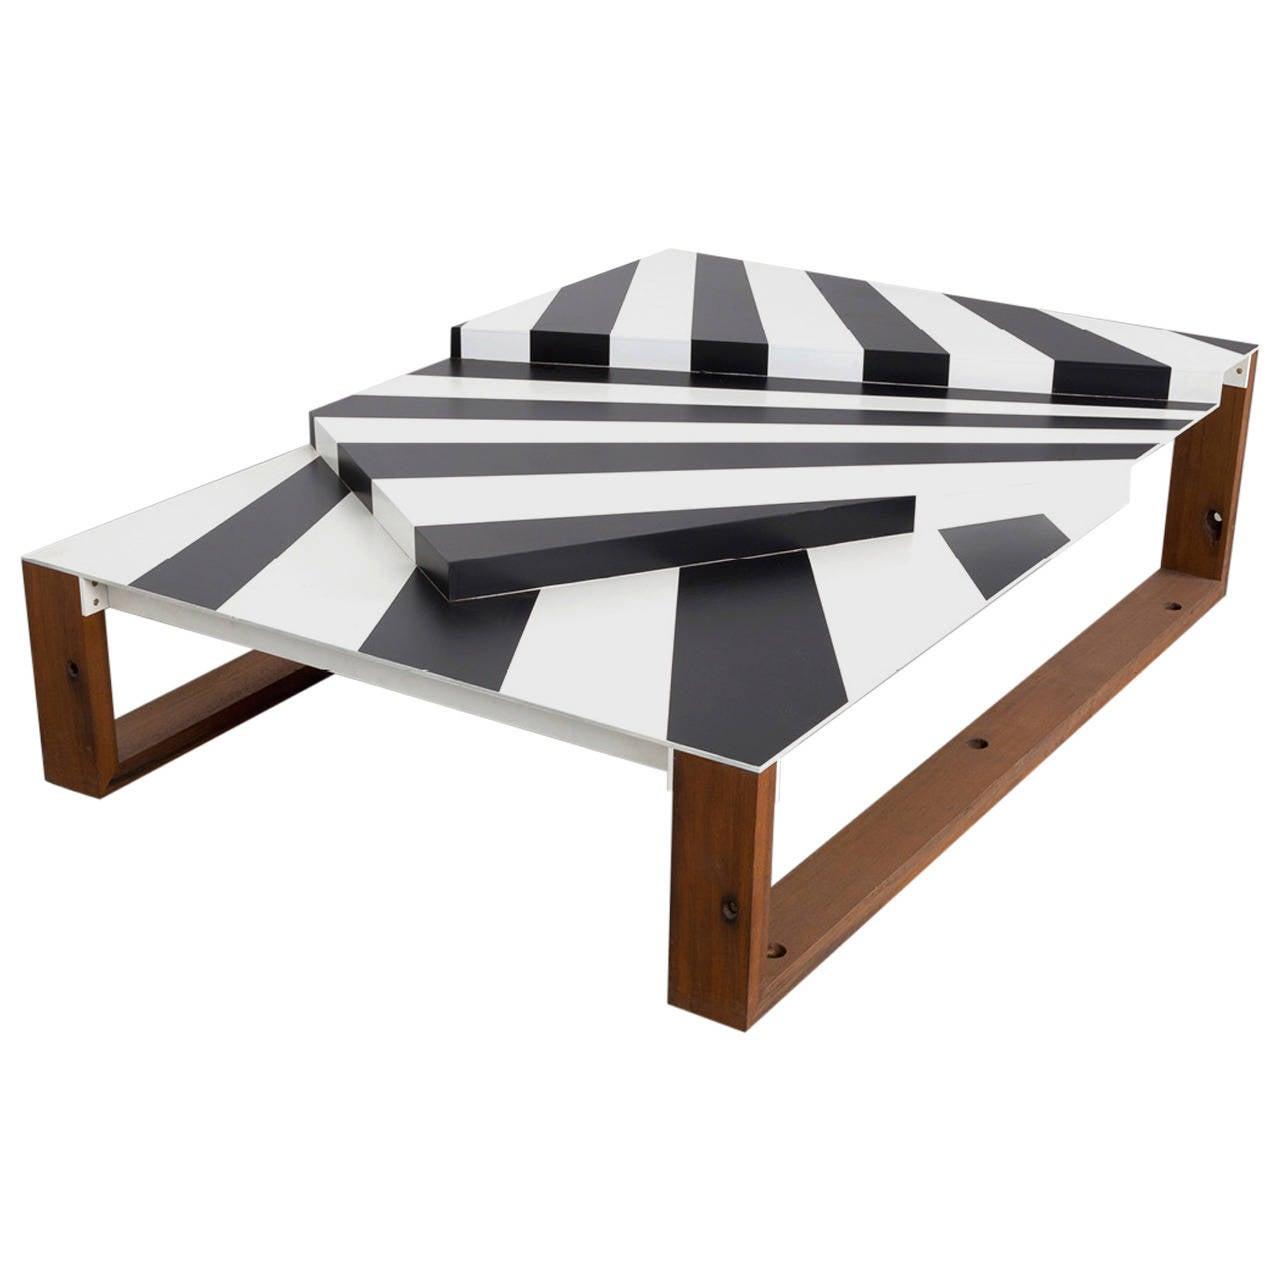 Dazzle Coffee Table by Uhuru Design, Reclaimed Teak